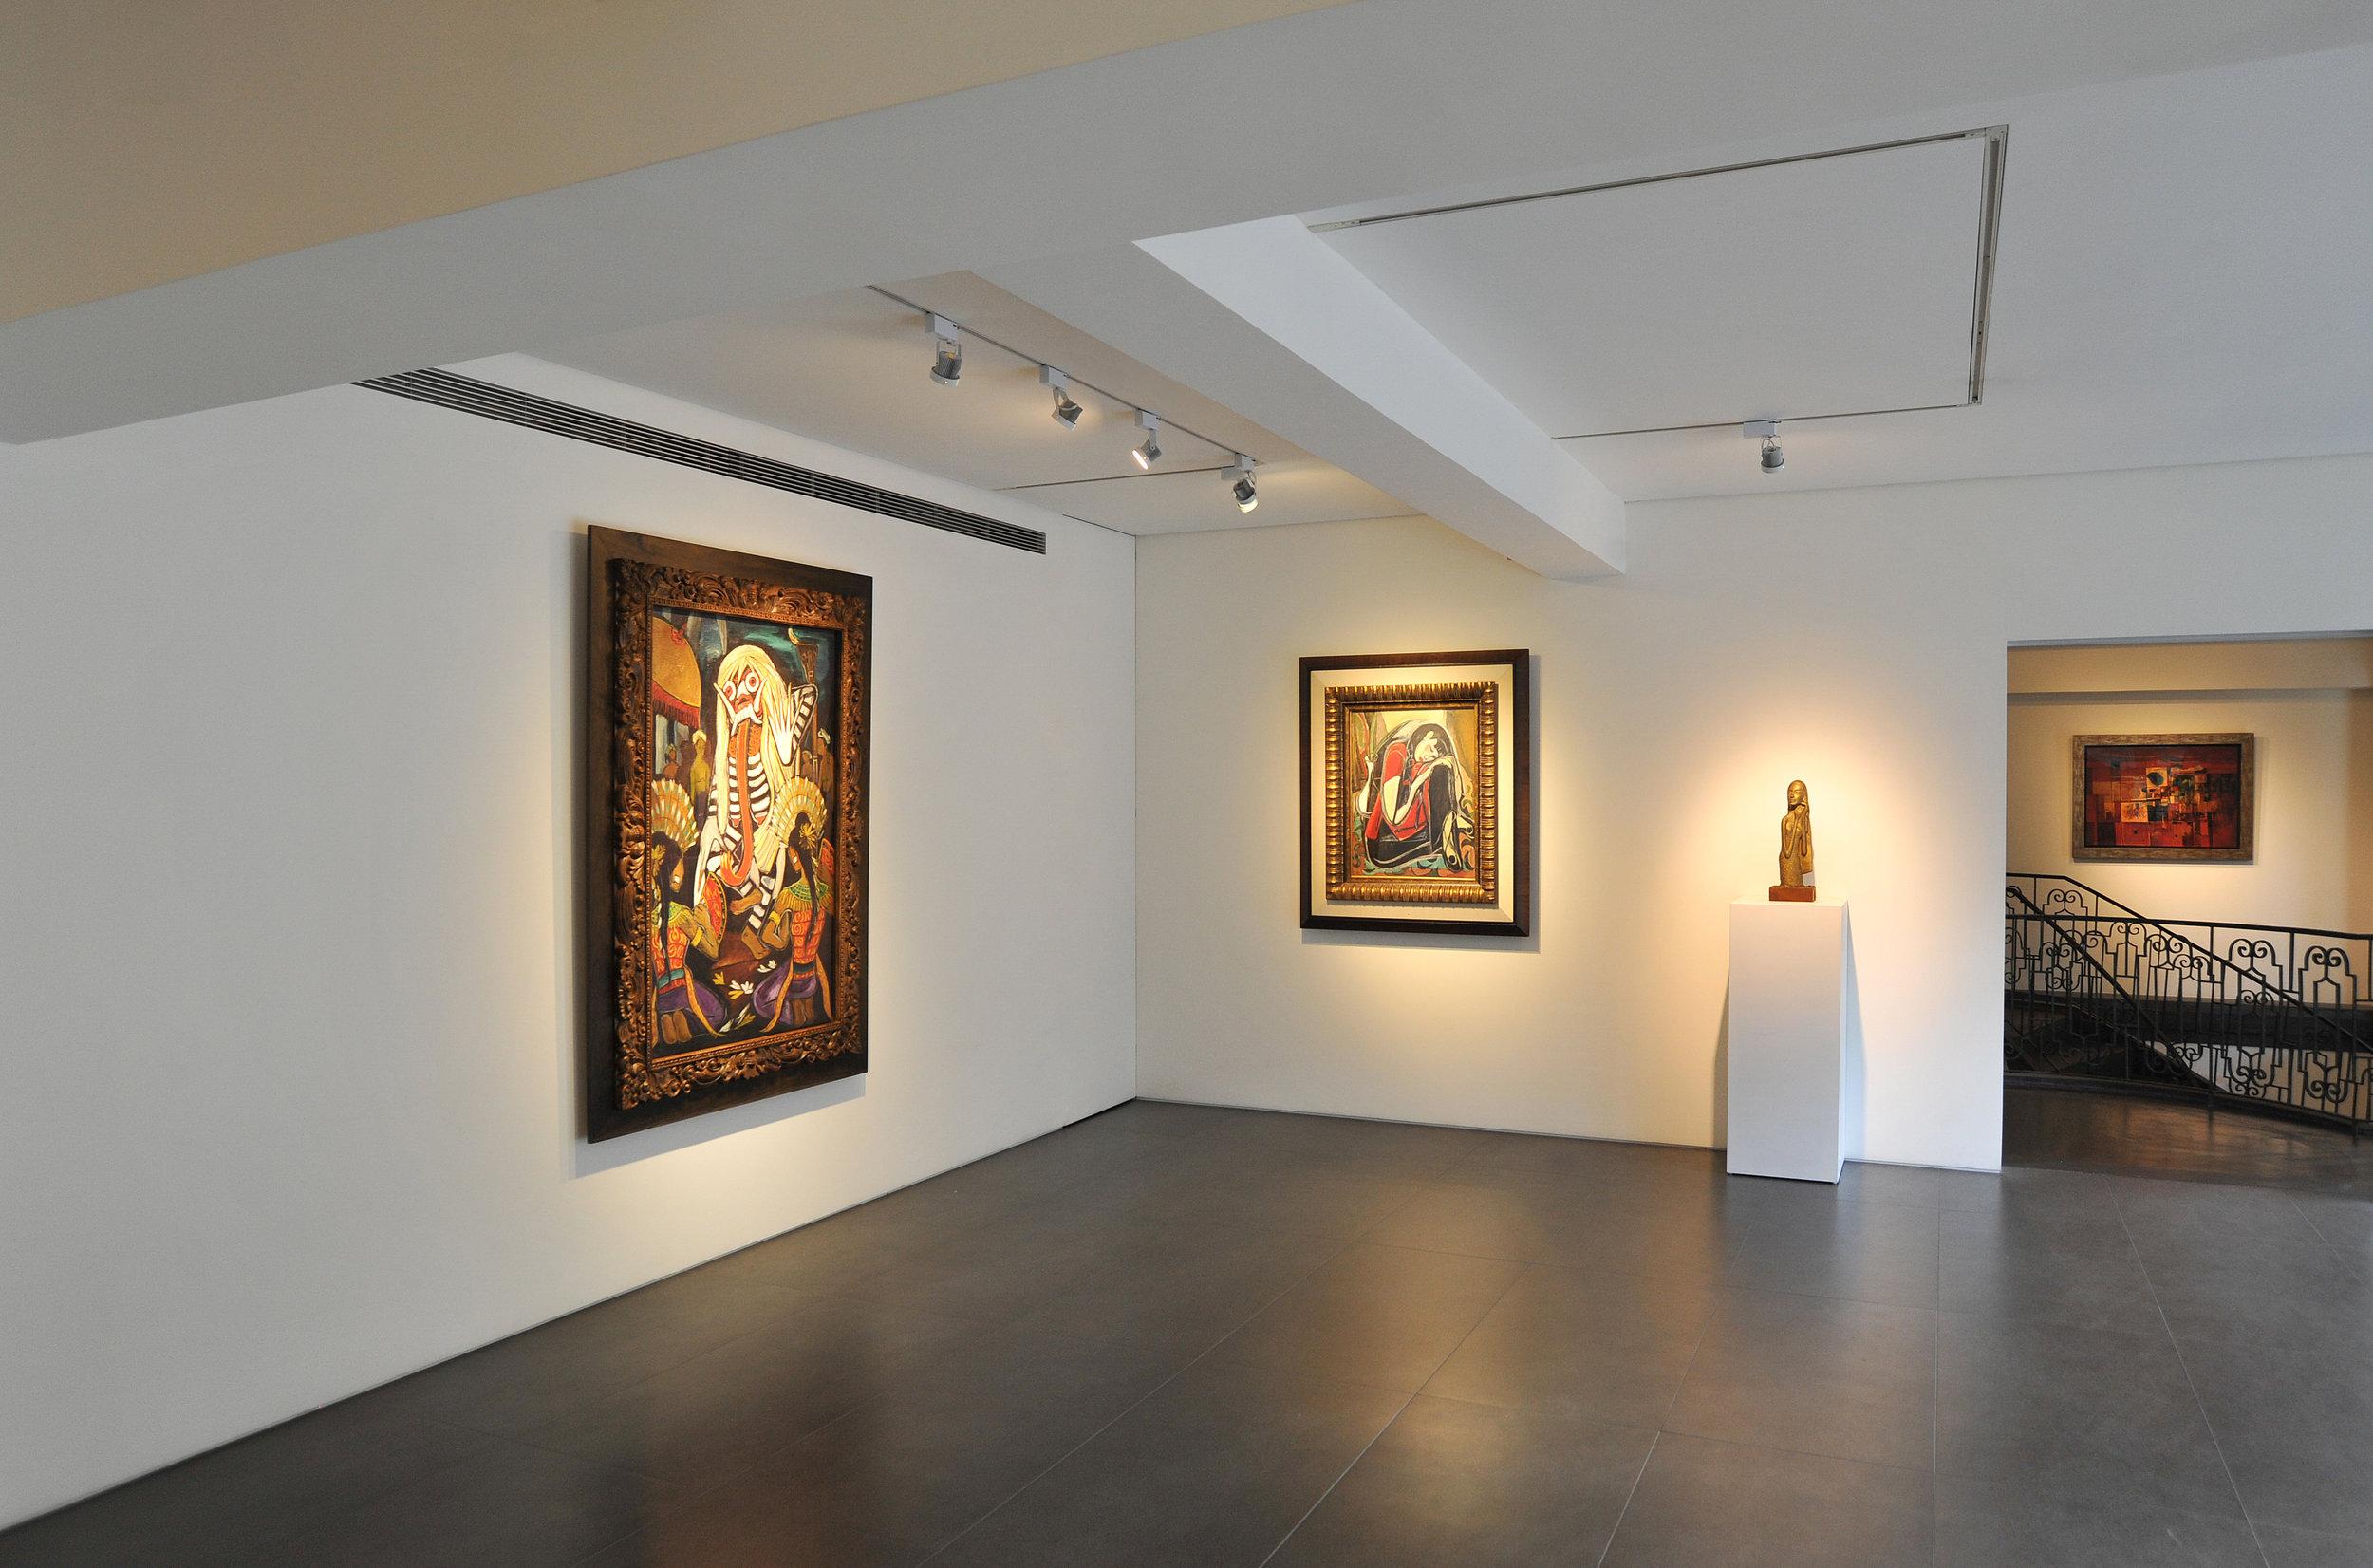 Cheong Soo Pieng: A Centenary Celebration in Taiwan within Asia Art Center, Taipei, Taiwan